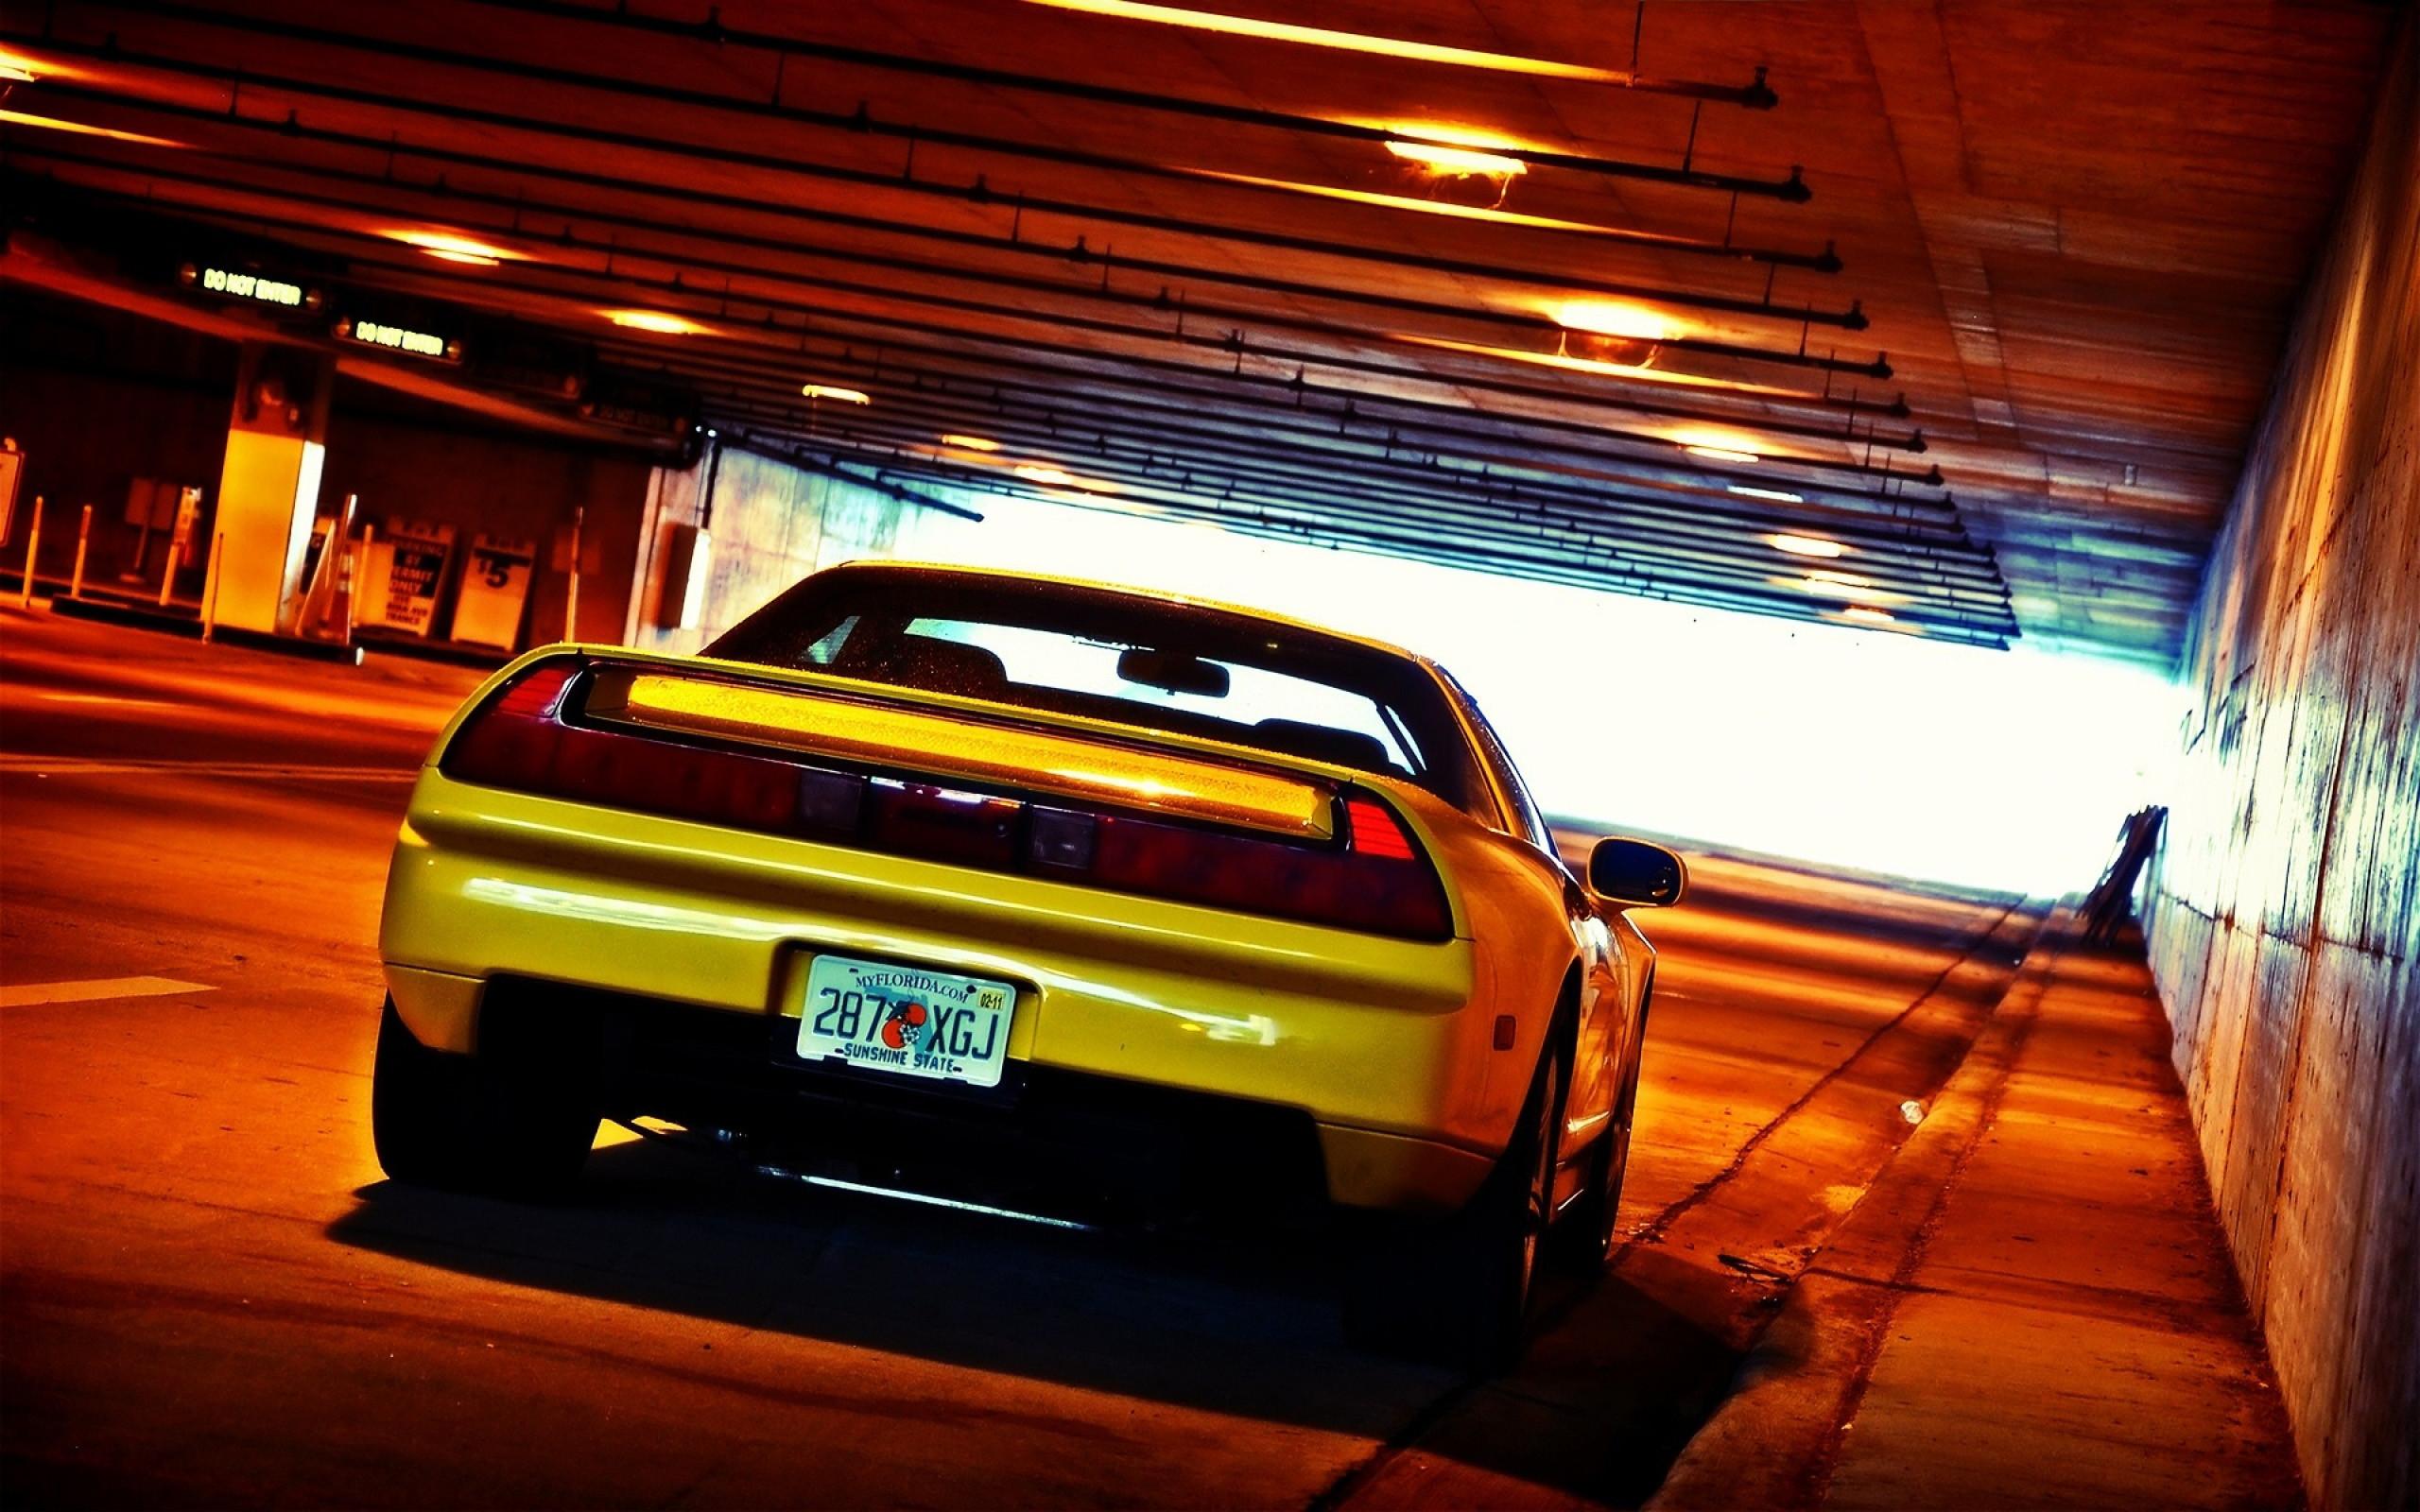 HD Wallpaper of Yellow Cars Honda Nsx Tunnel Jdm, Desktop Wallpaper Yellow  Cars Honda Nsx